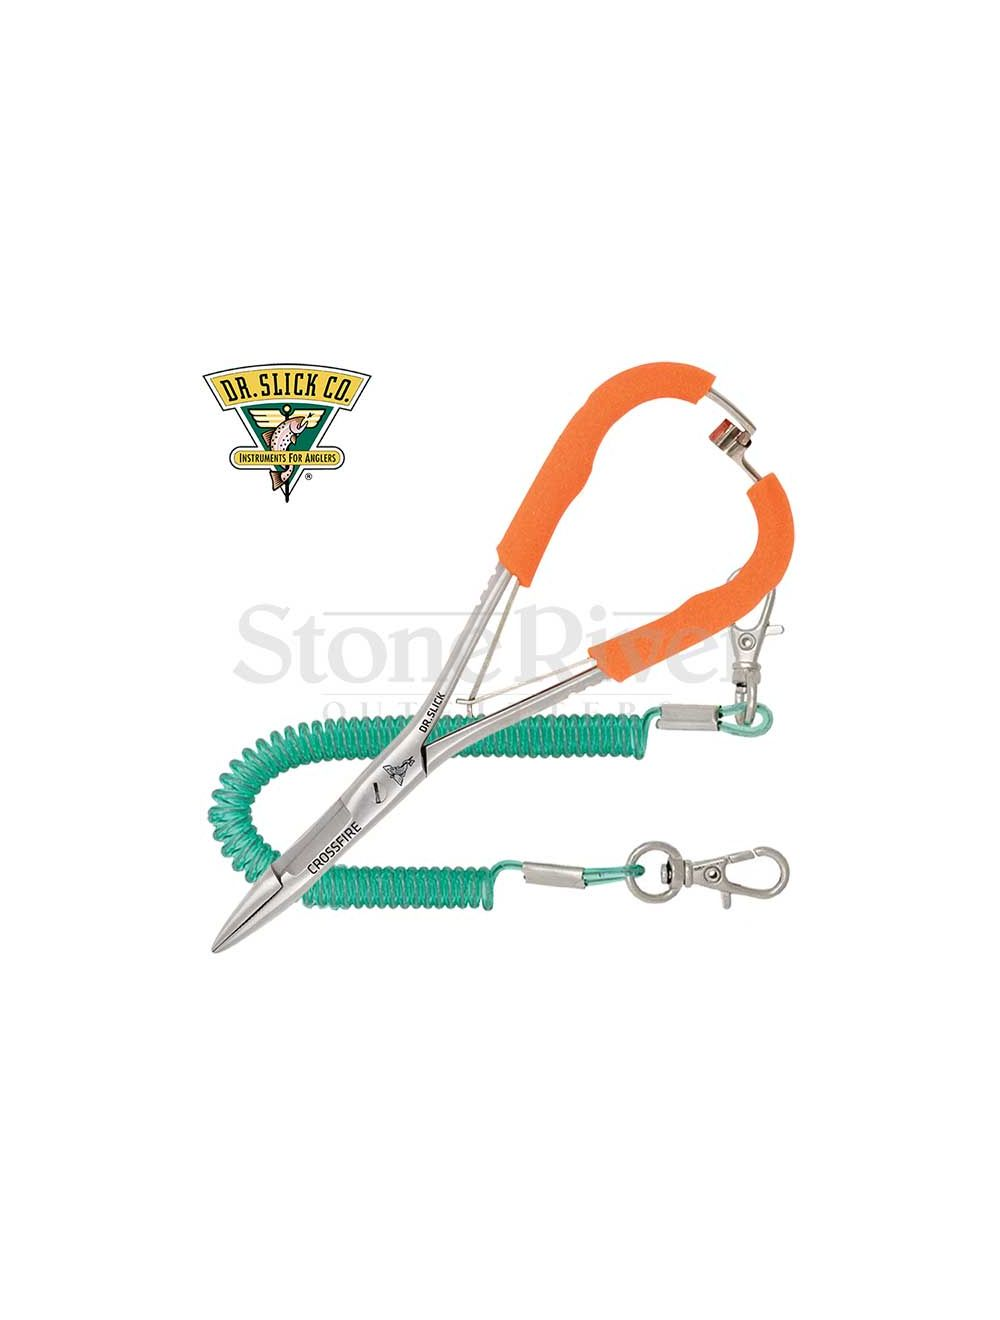 Crossfire Mitten Scissor Clamps Dr Slick Forceps